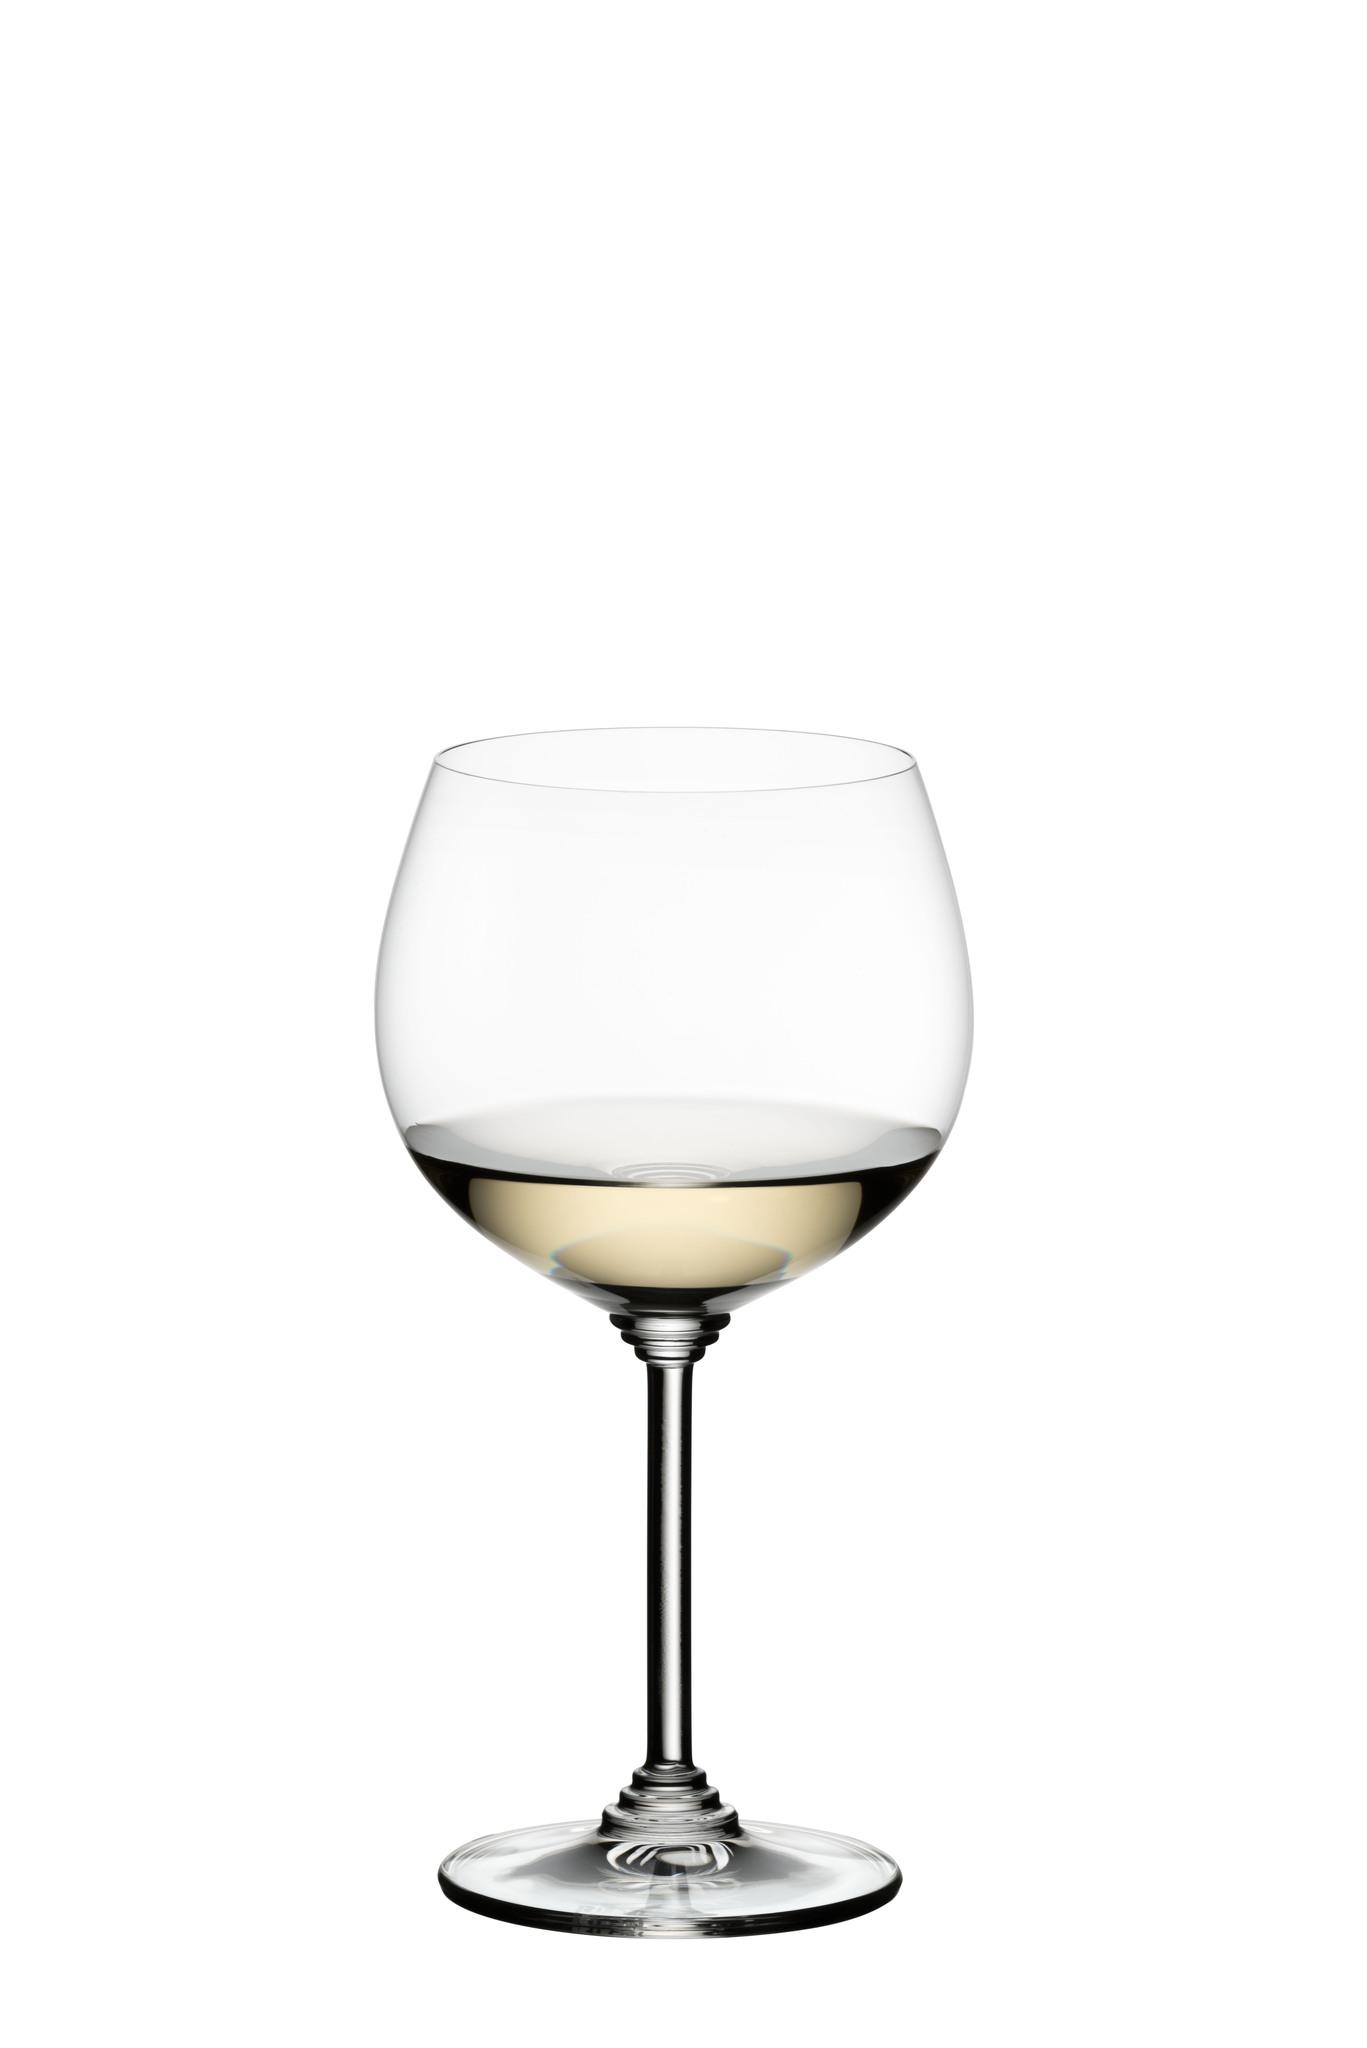 Бокалы Набор бокалов для белого вина 2шт 600мл Riedel Wine Chardonnay nabor-bokalov-dlya-belogo-vina-2-sht-600-ml-riedel-wine-chardonnay-avstriya.jpg